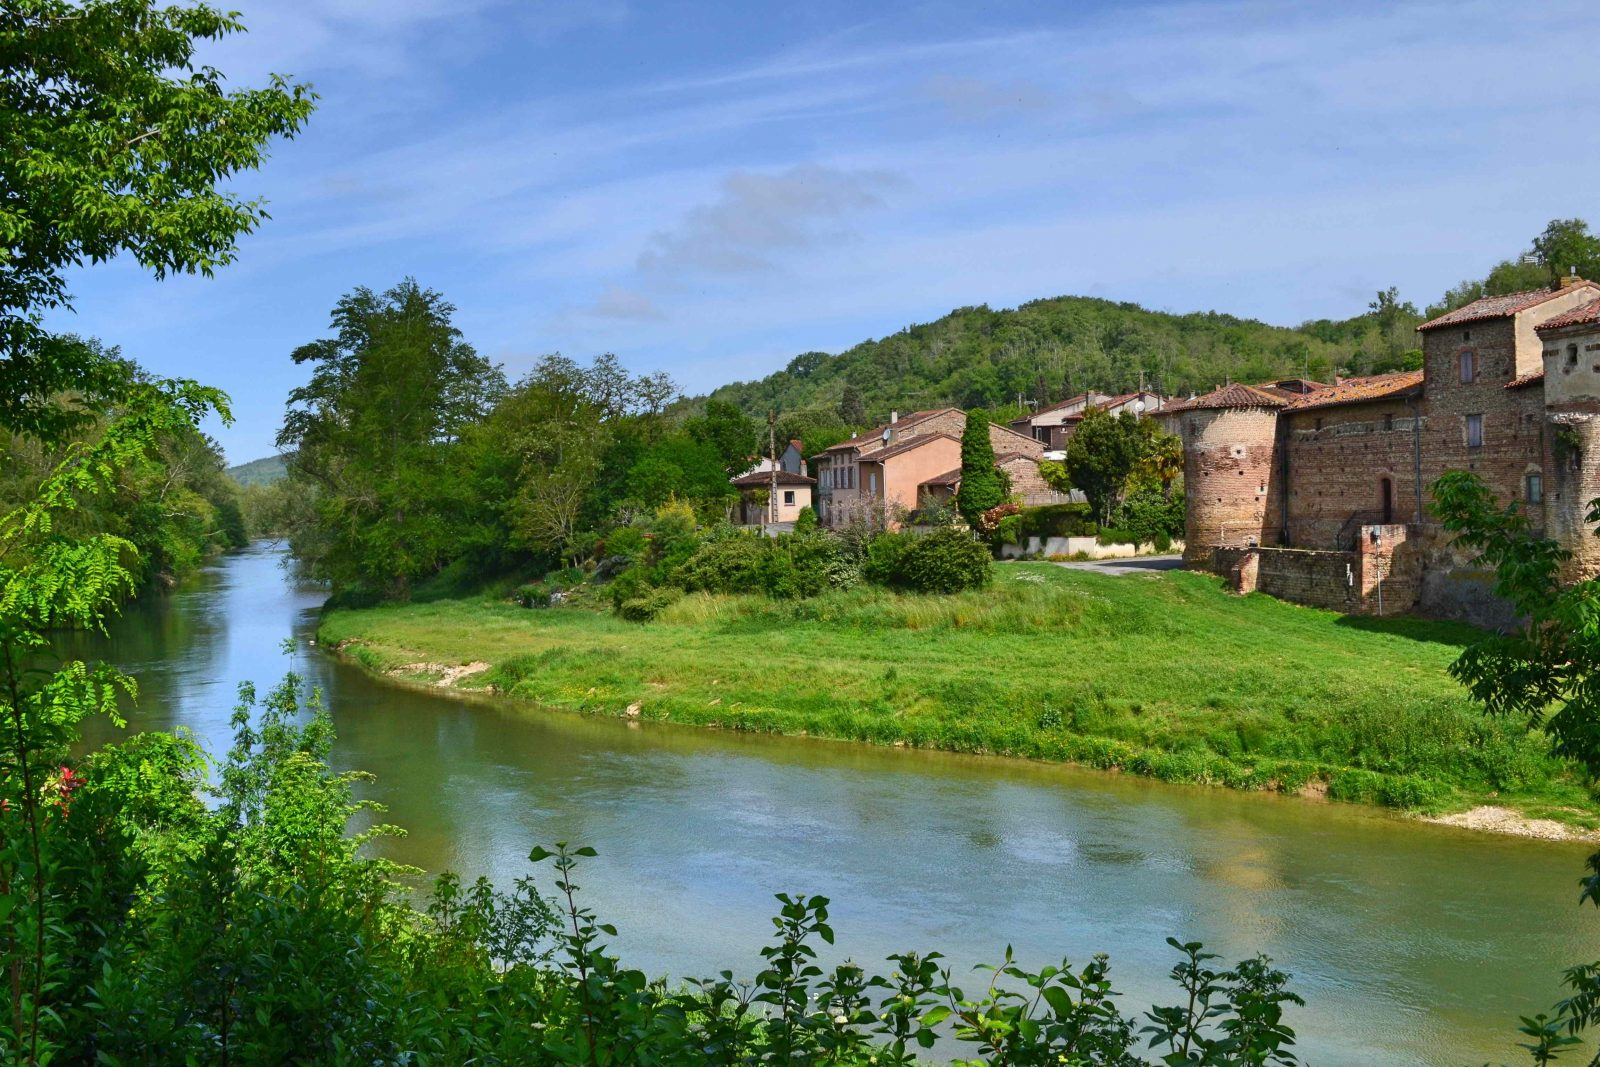 Calmont Hers Casa fortificada © Lauragais Tourisme